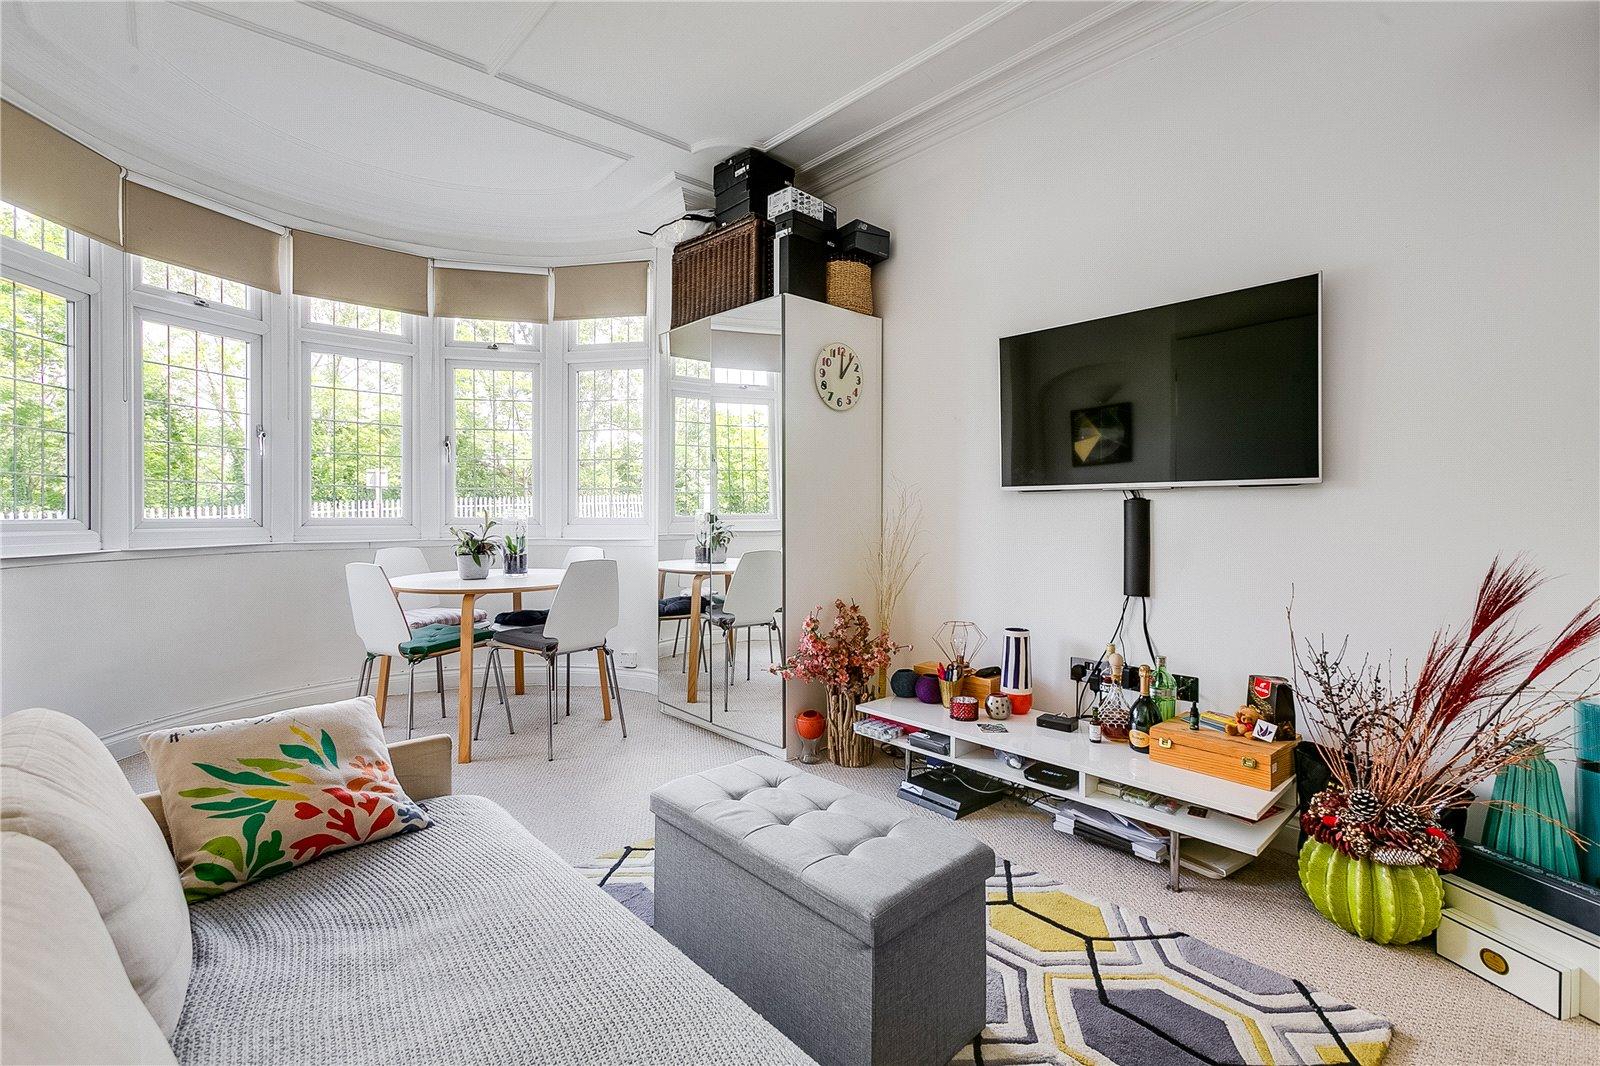 Drewstead road living room